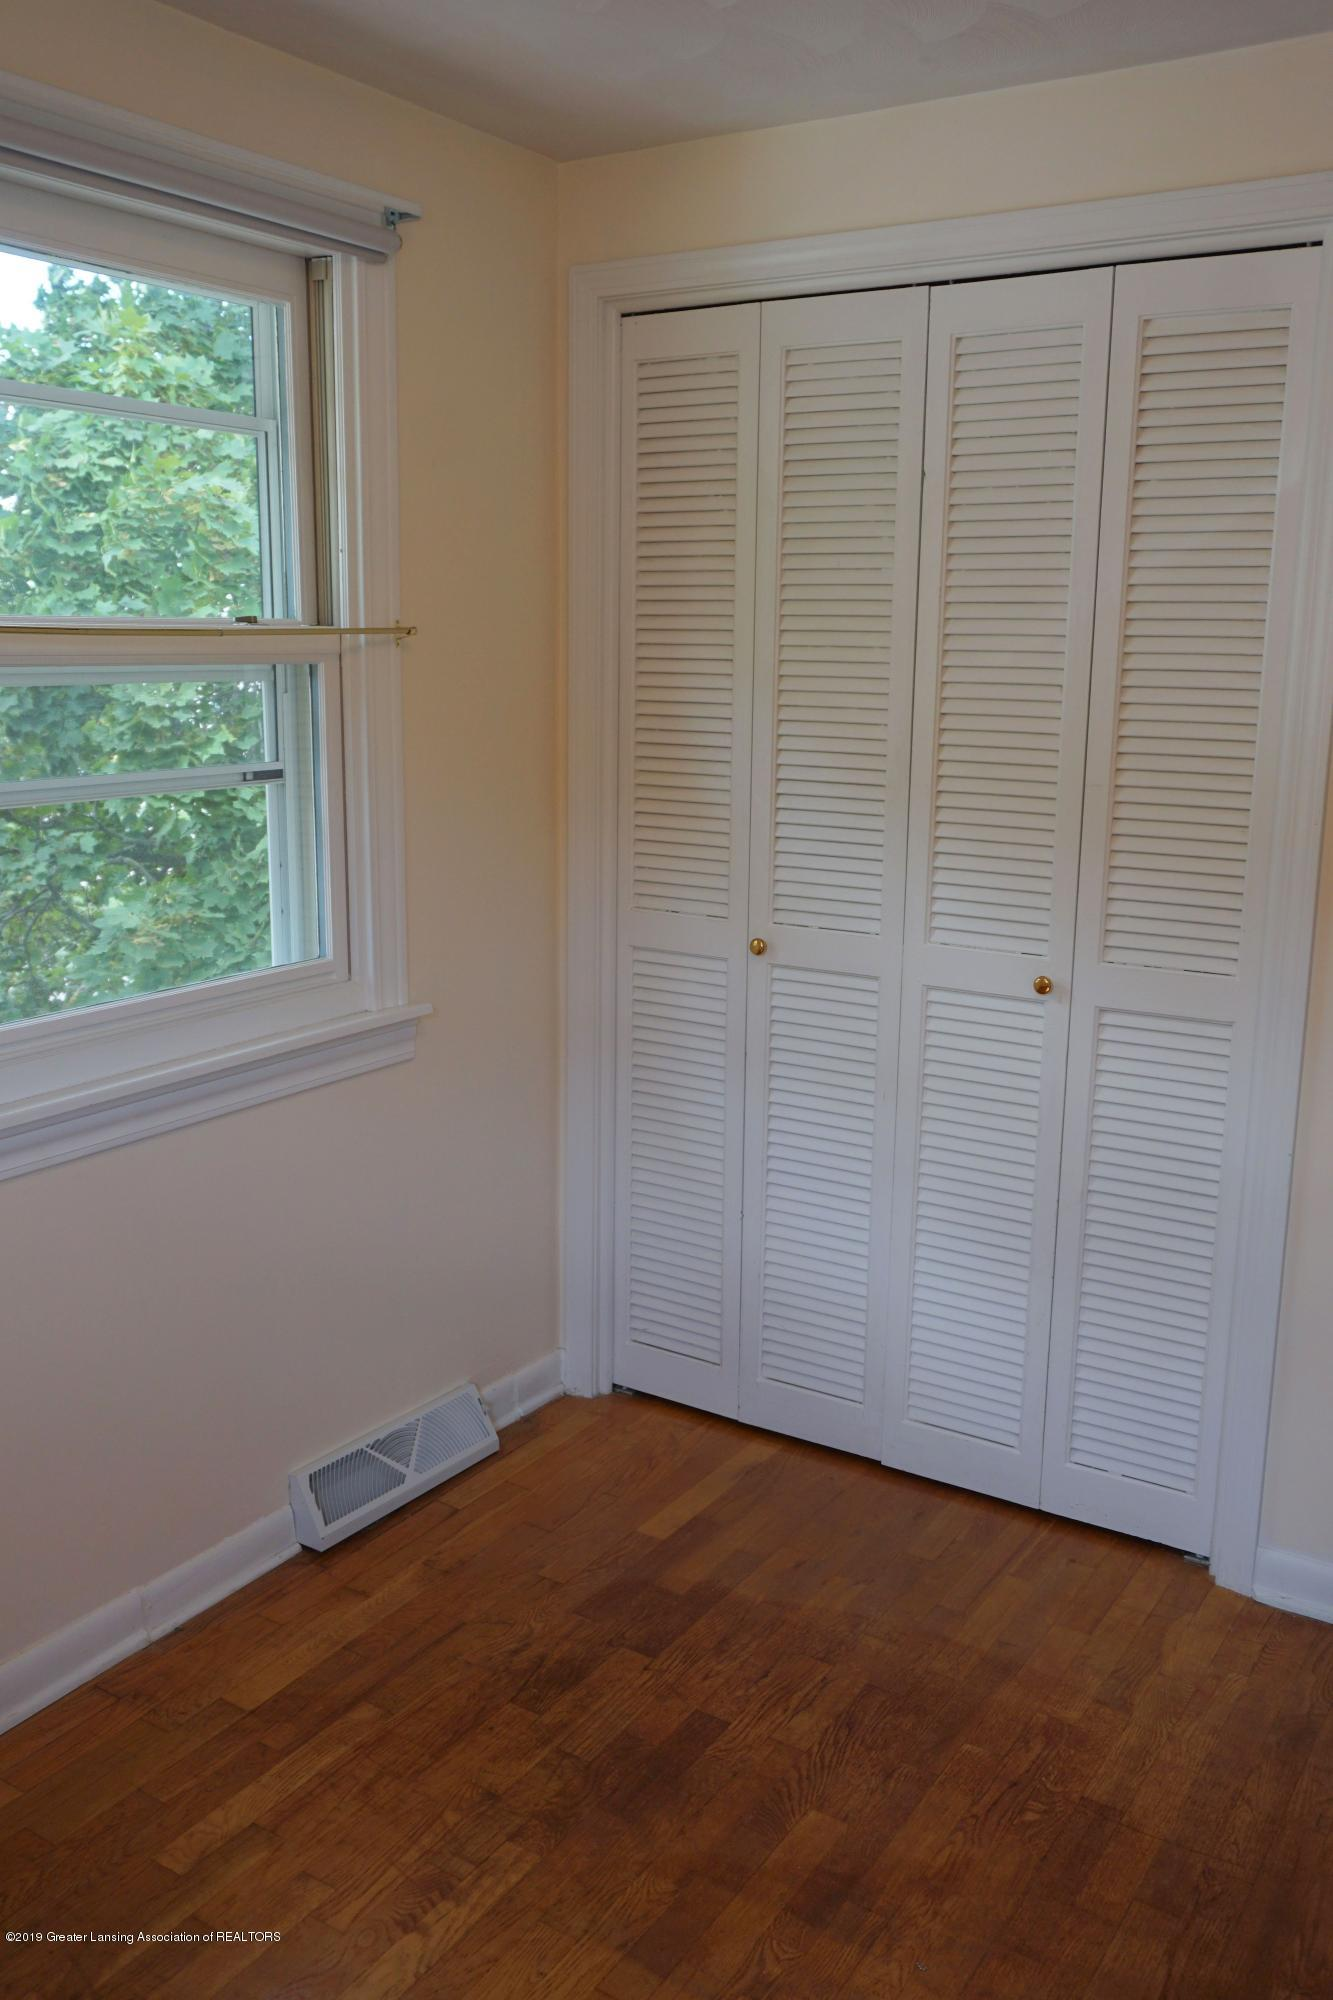 809 S Lansing St - Bedroom #3 Closet - 26